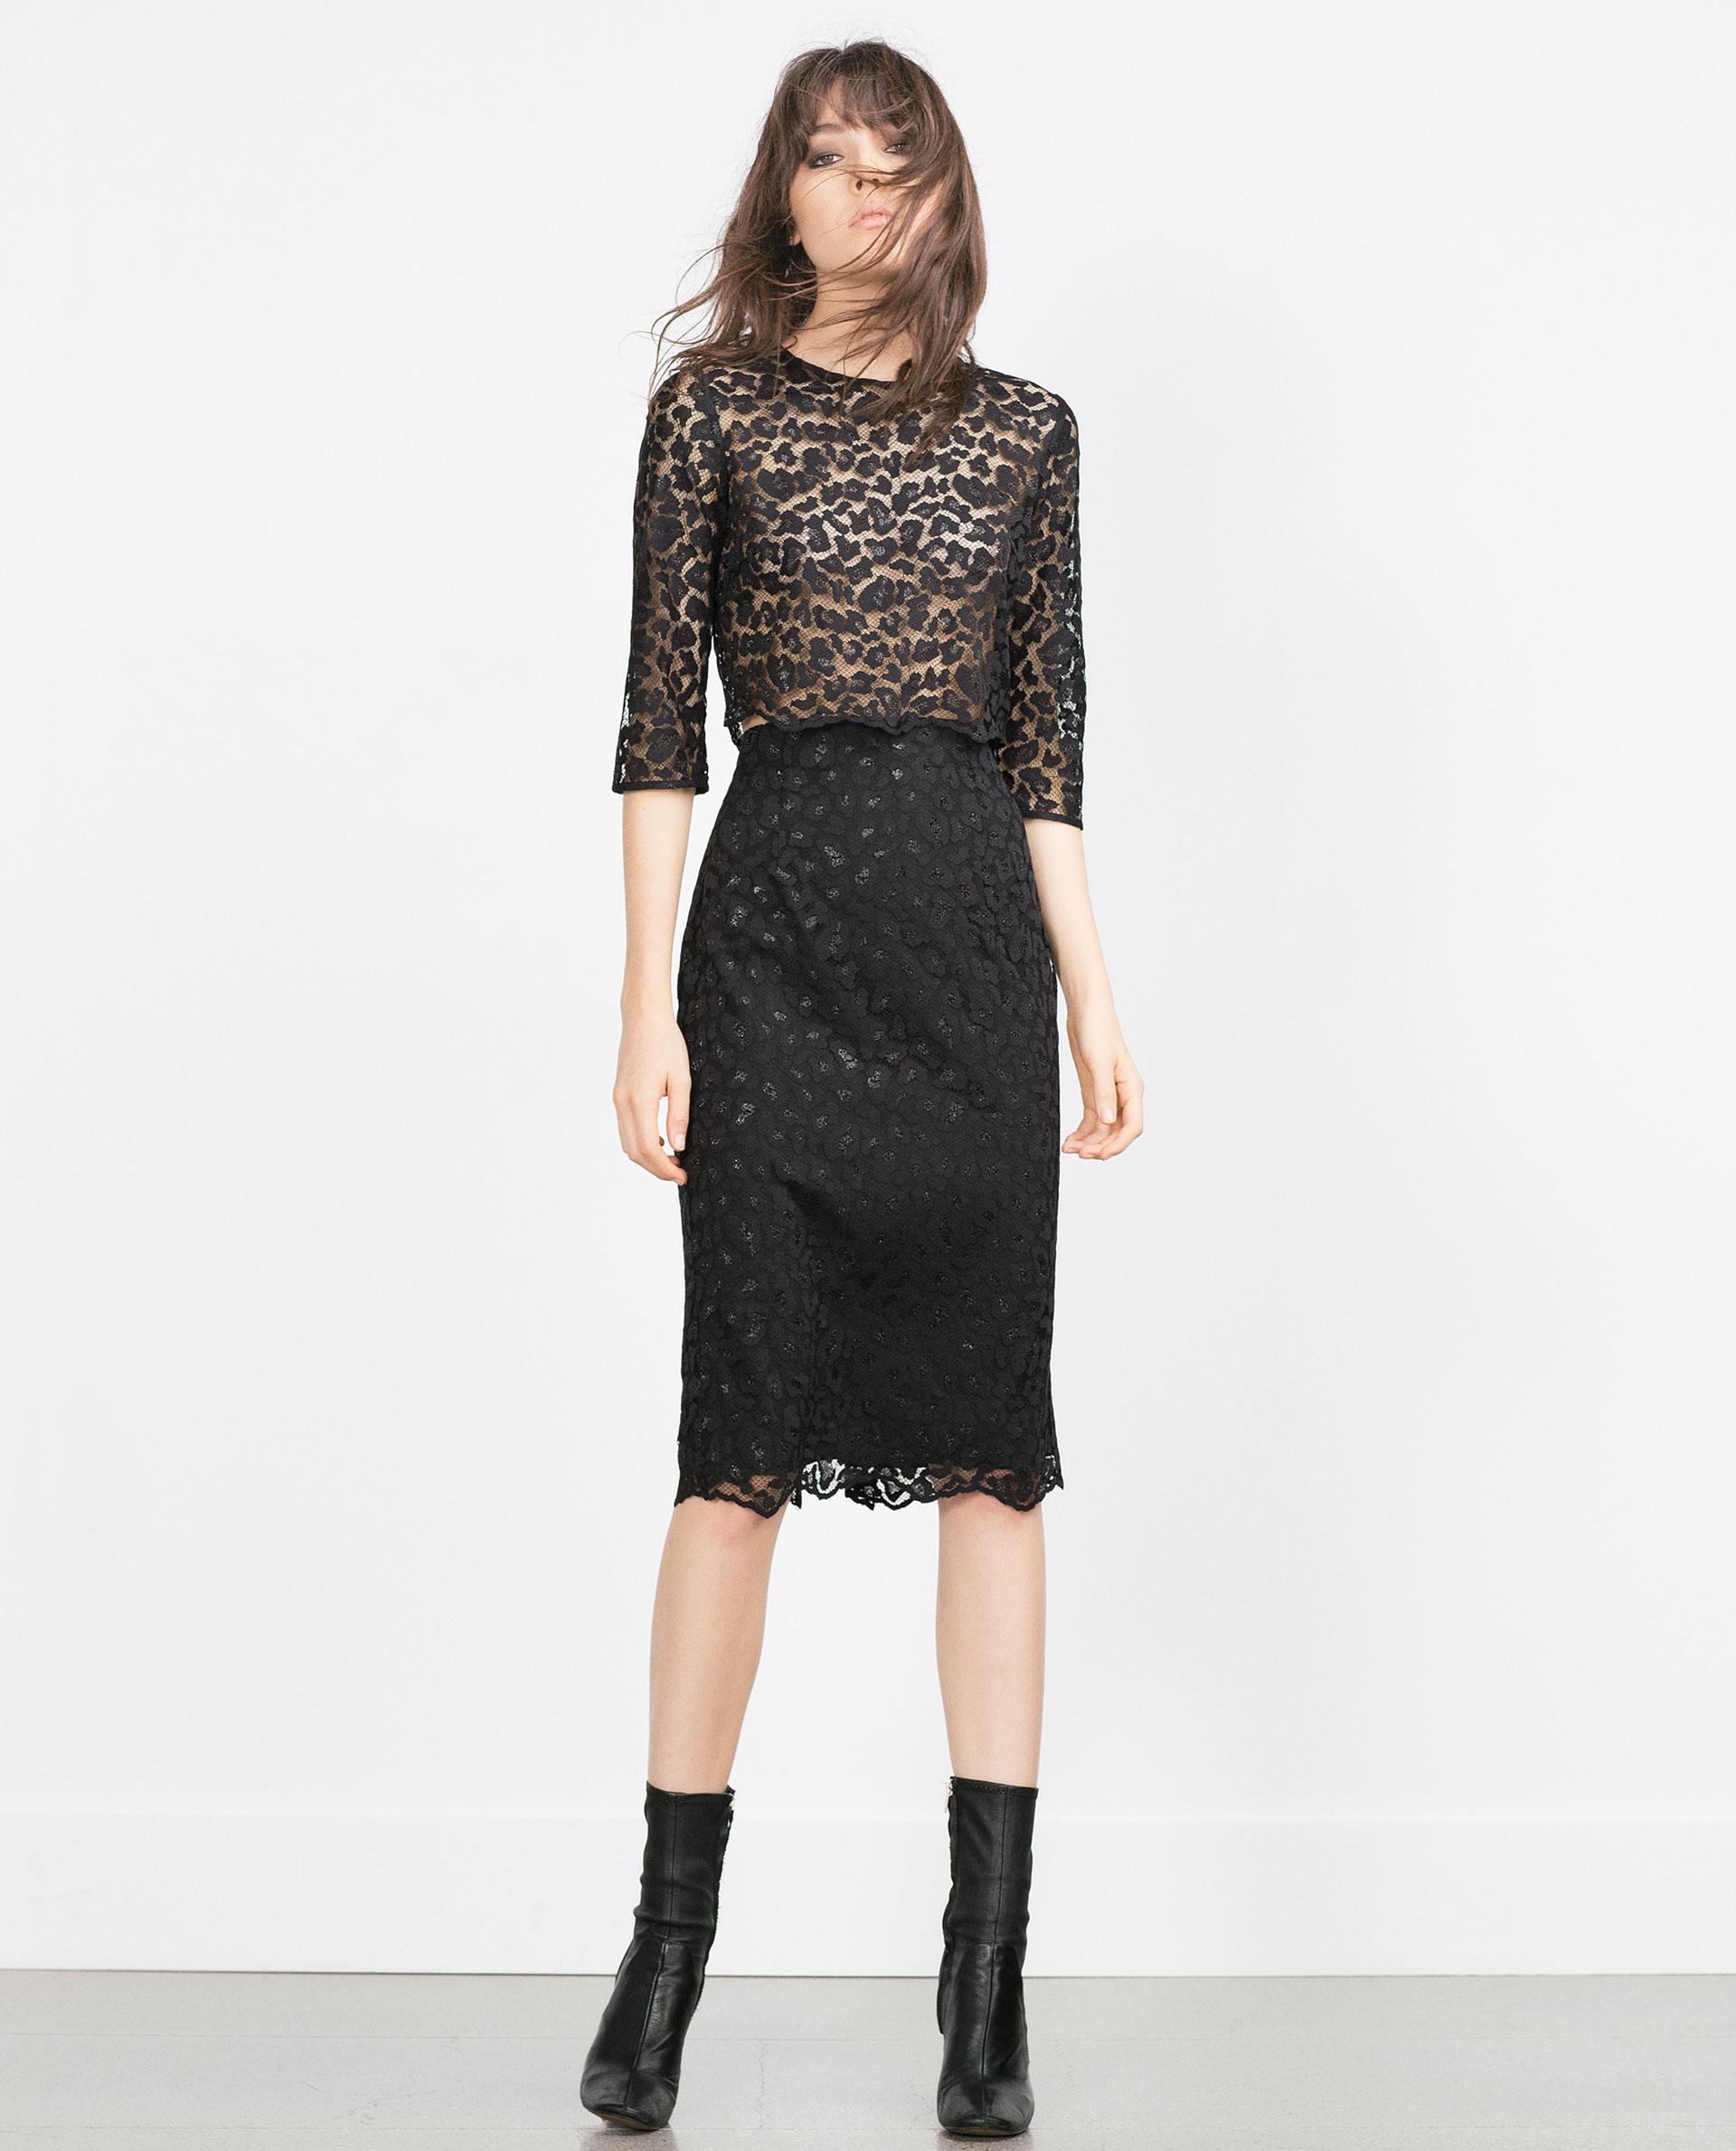 Zara Lace Pencil Skirt in Black | Lyst